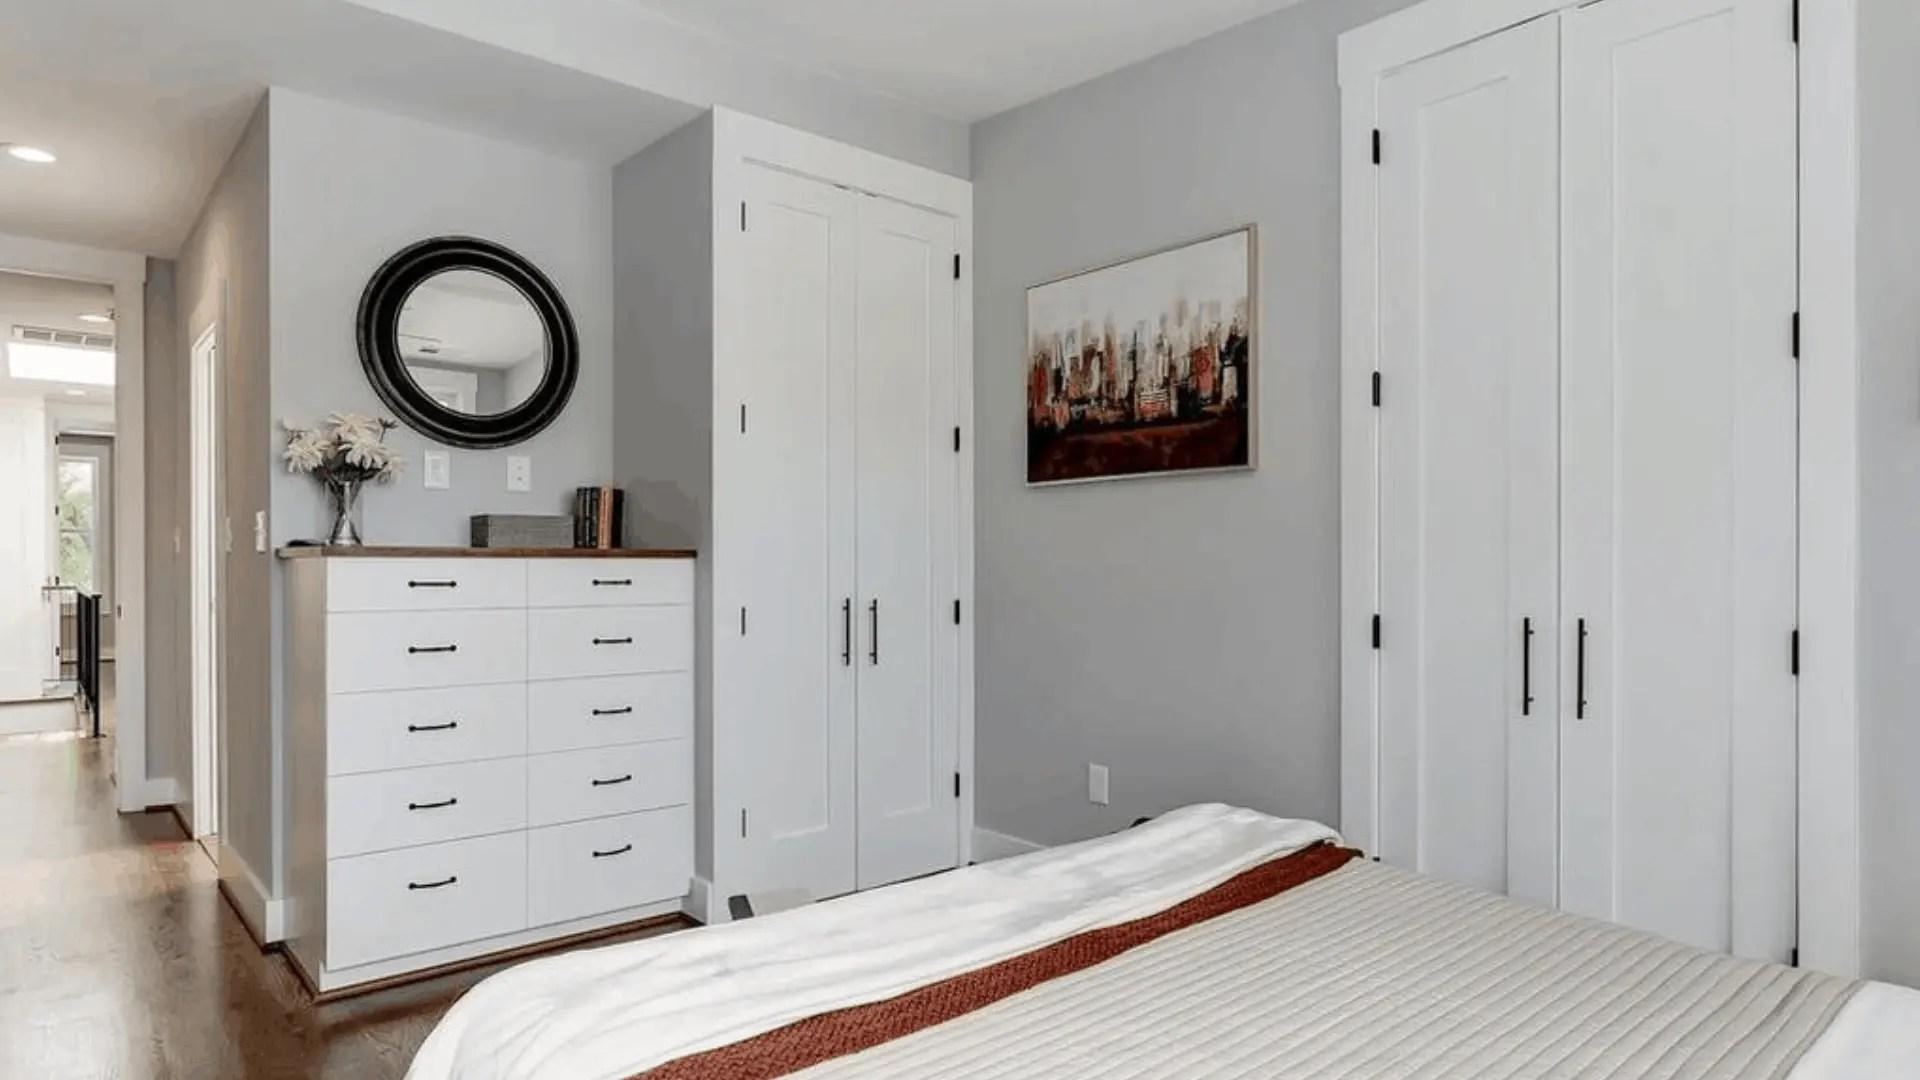 Tennessee_NE_bedroom_custom_cabinets_closets_1920x1080